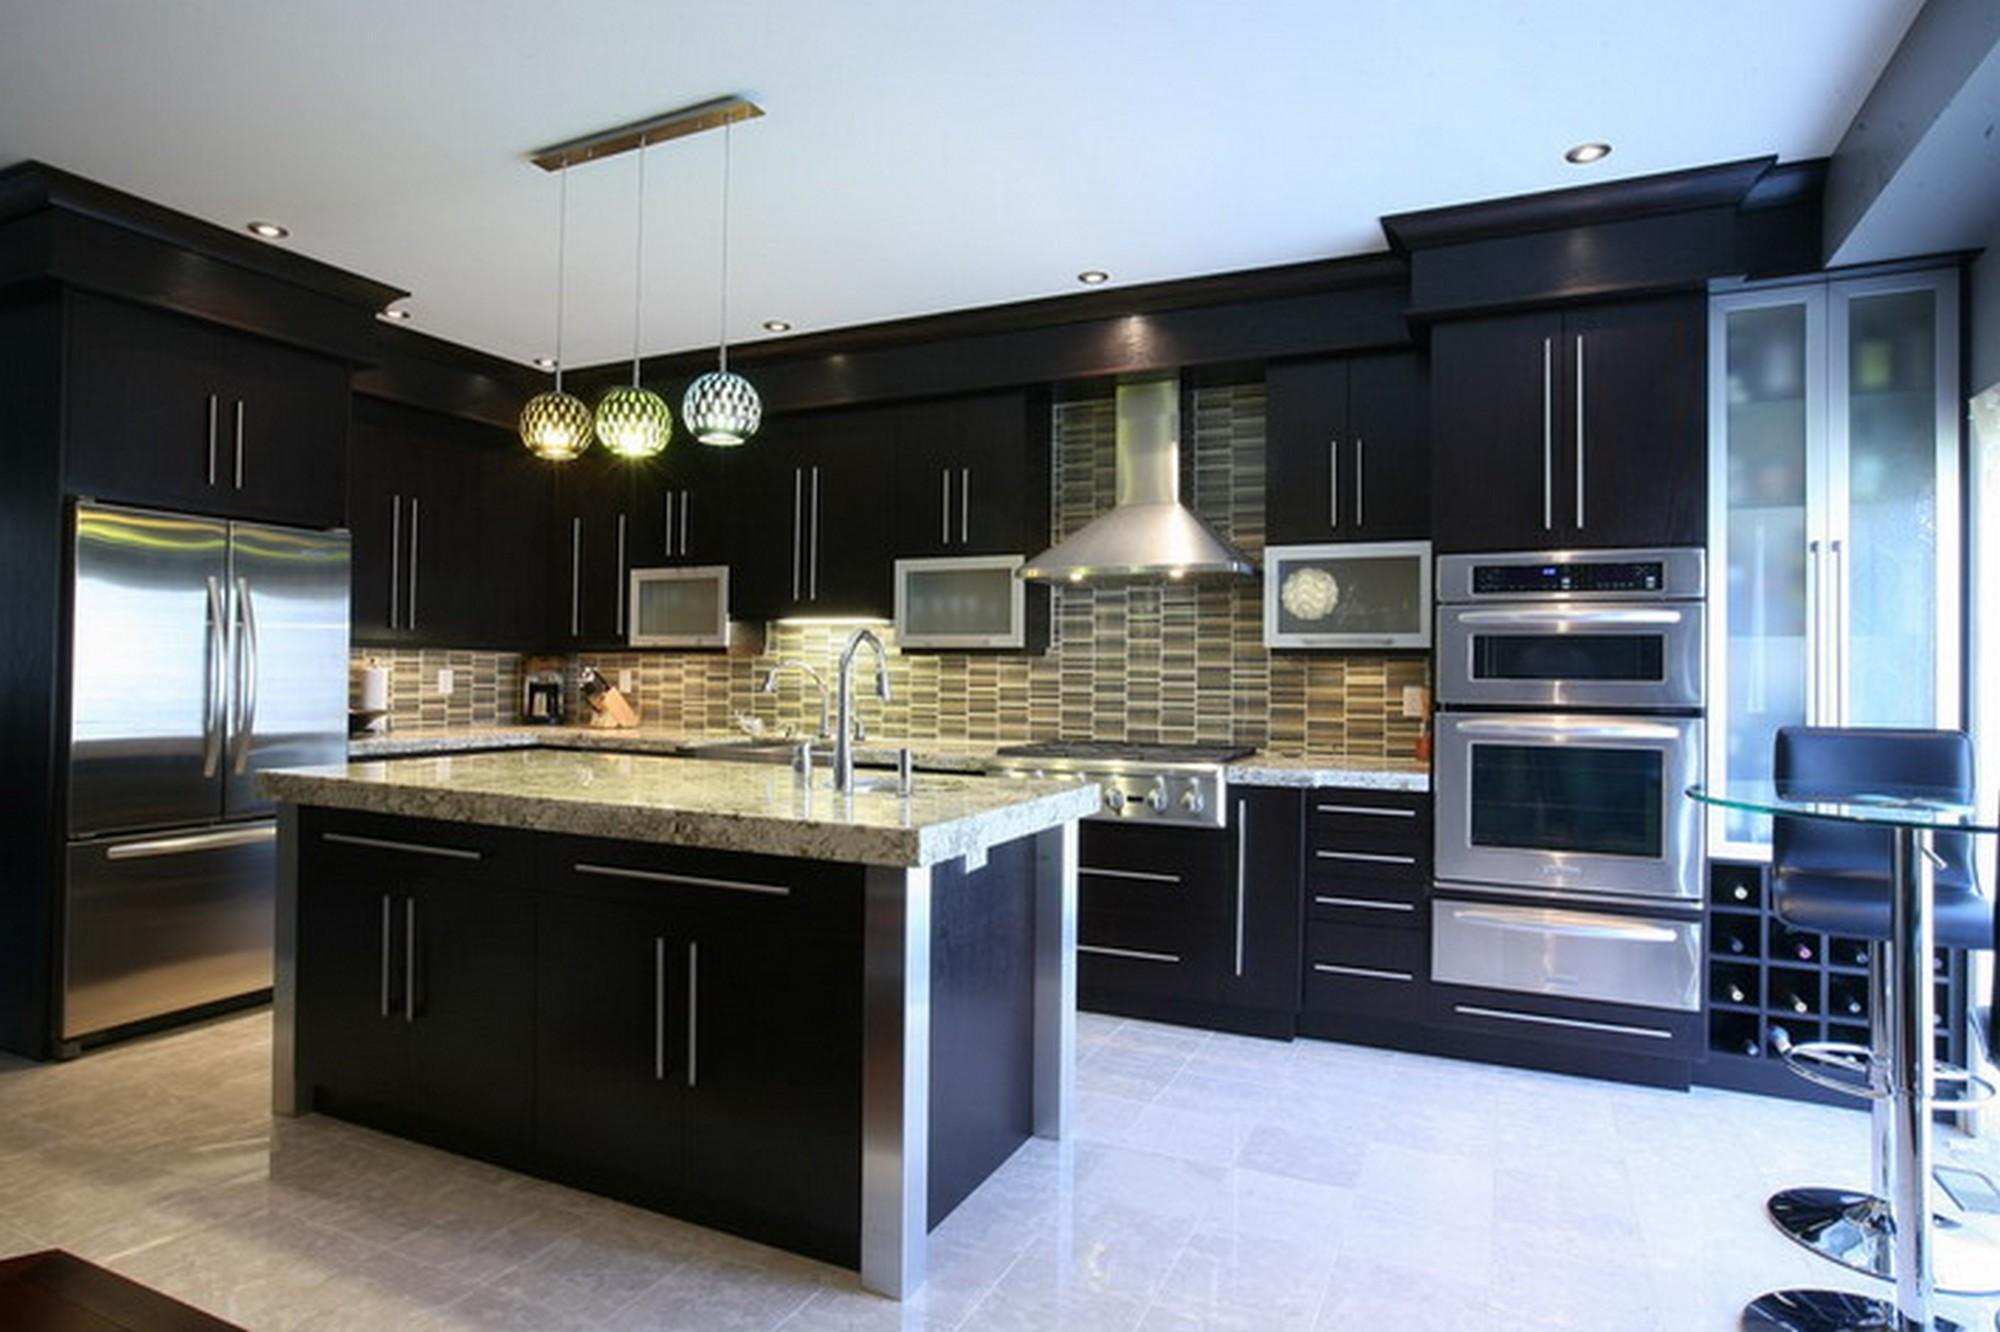 Dapur Moden Kontemporari  Desainrumahidcom